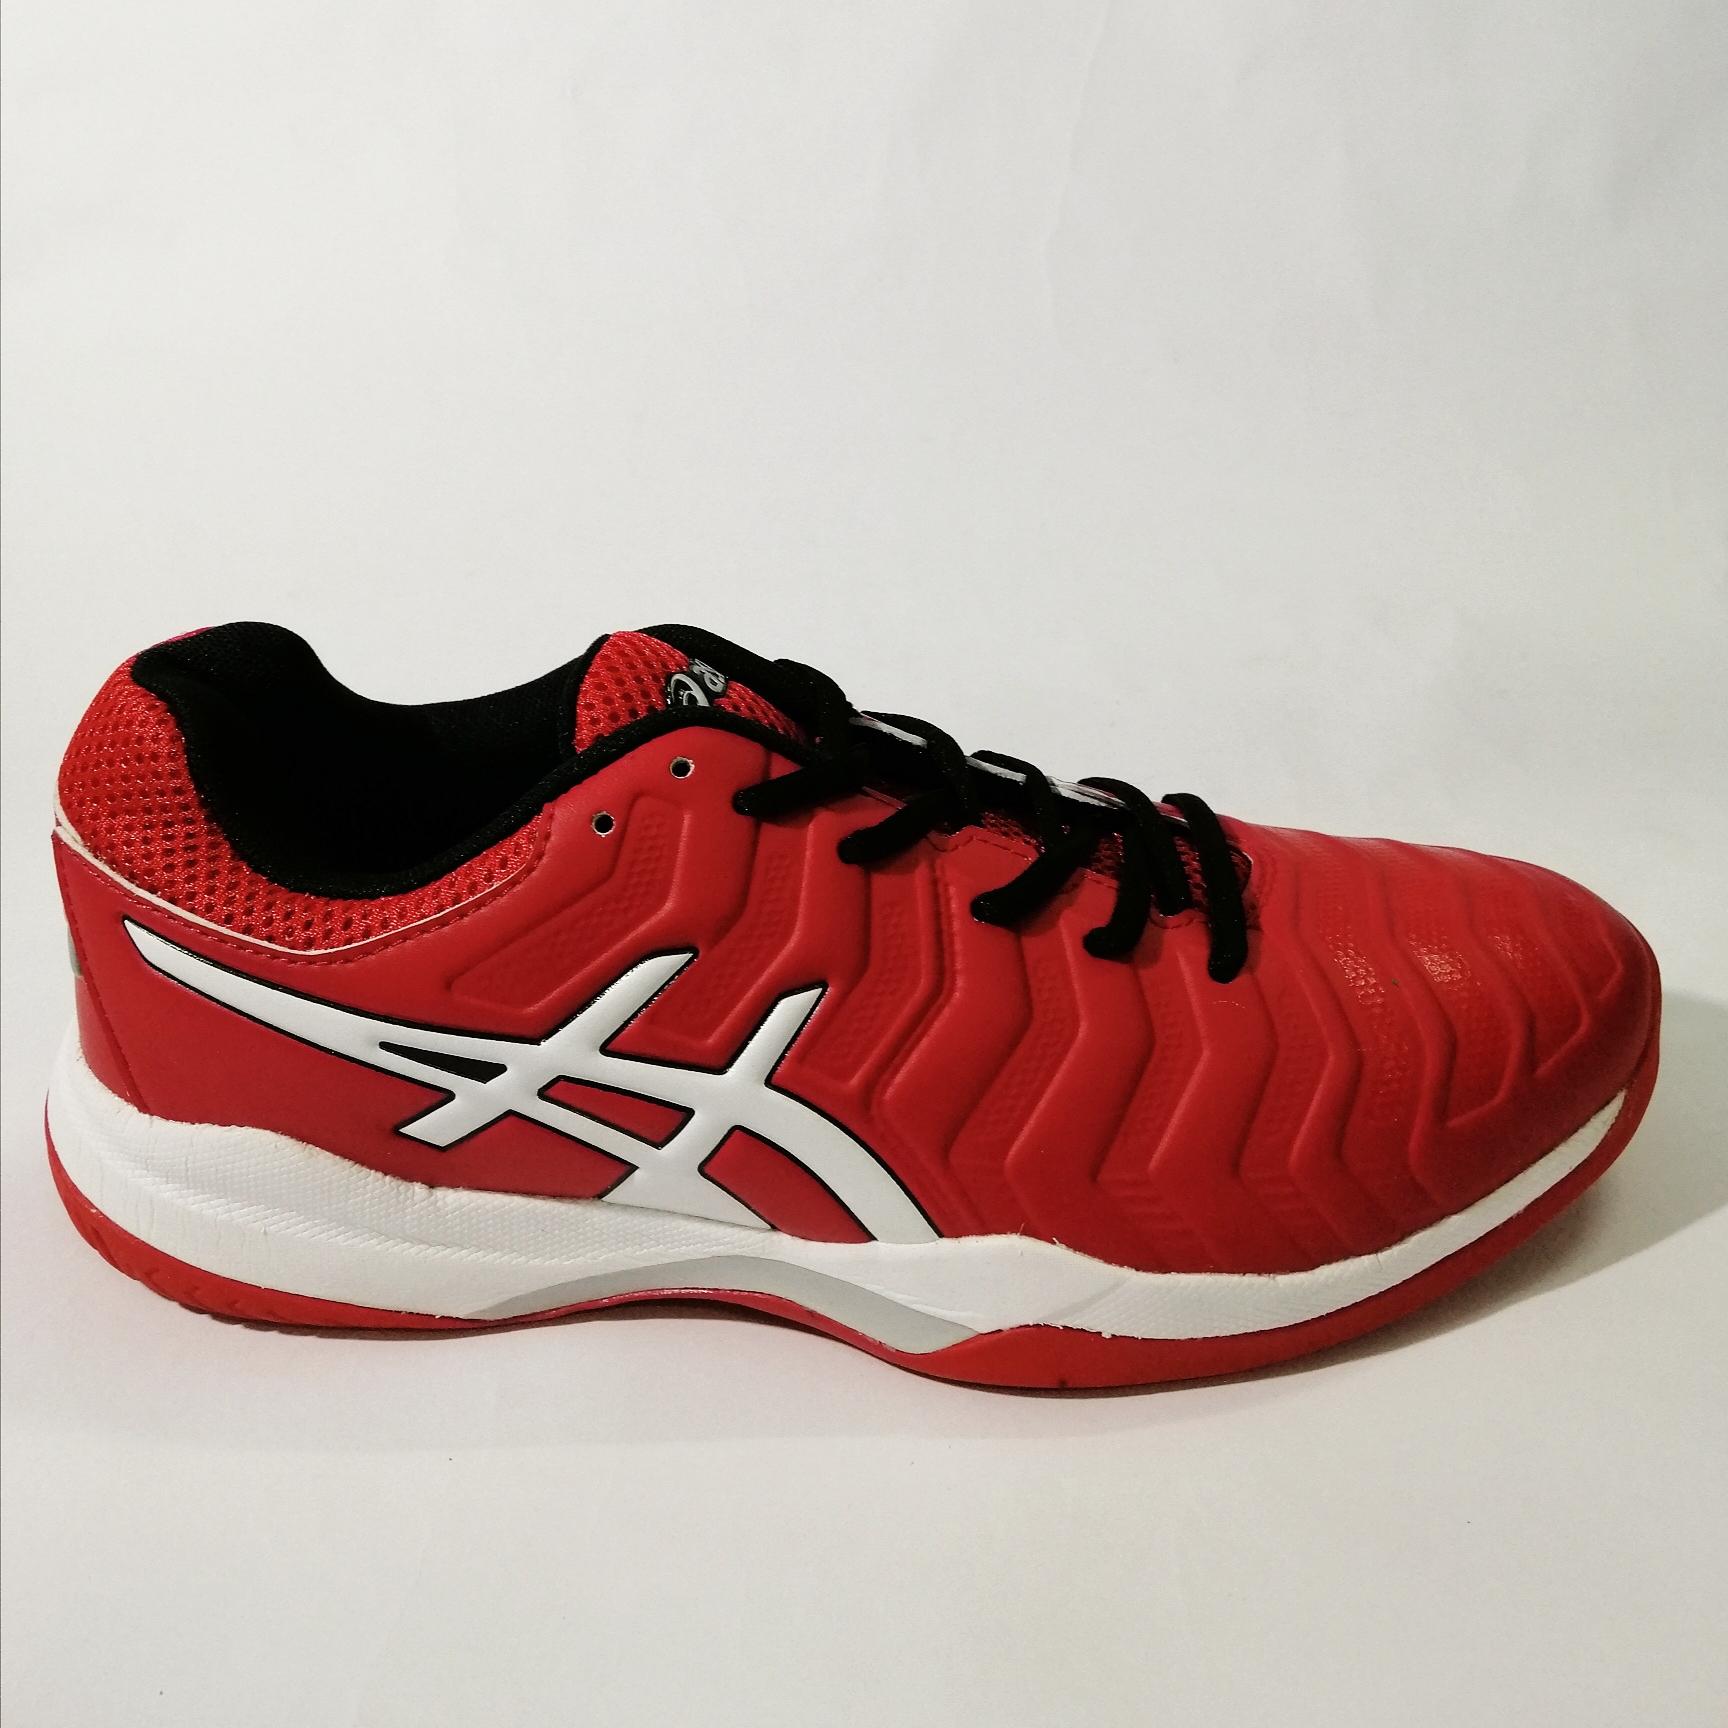 giá giày asics tennis